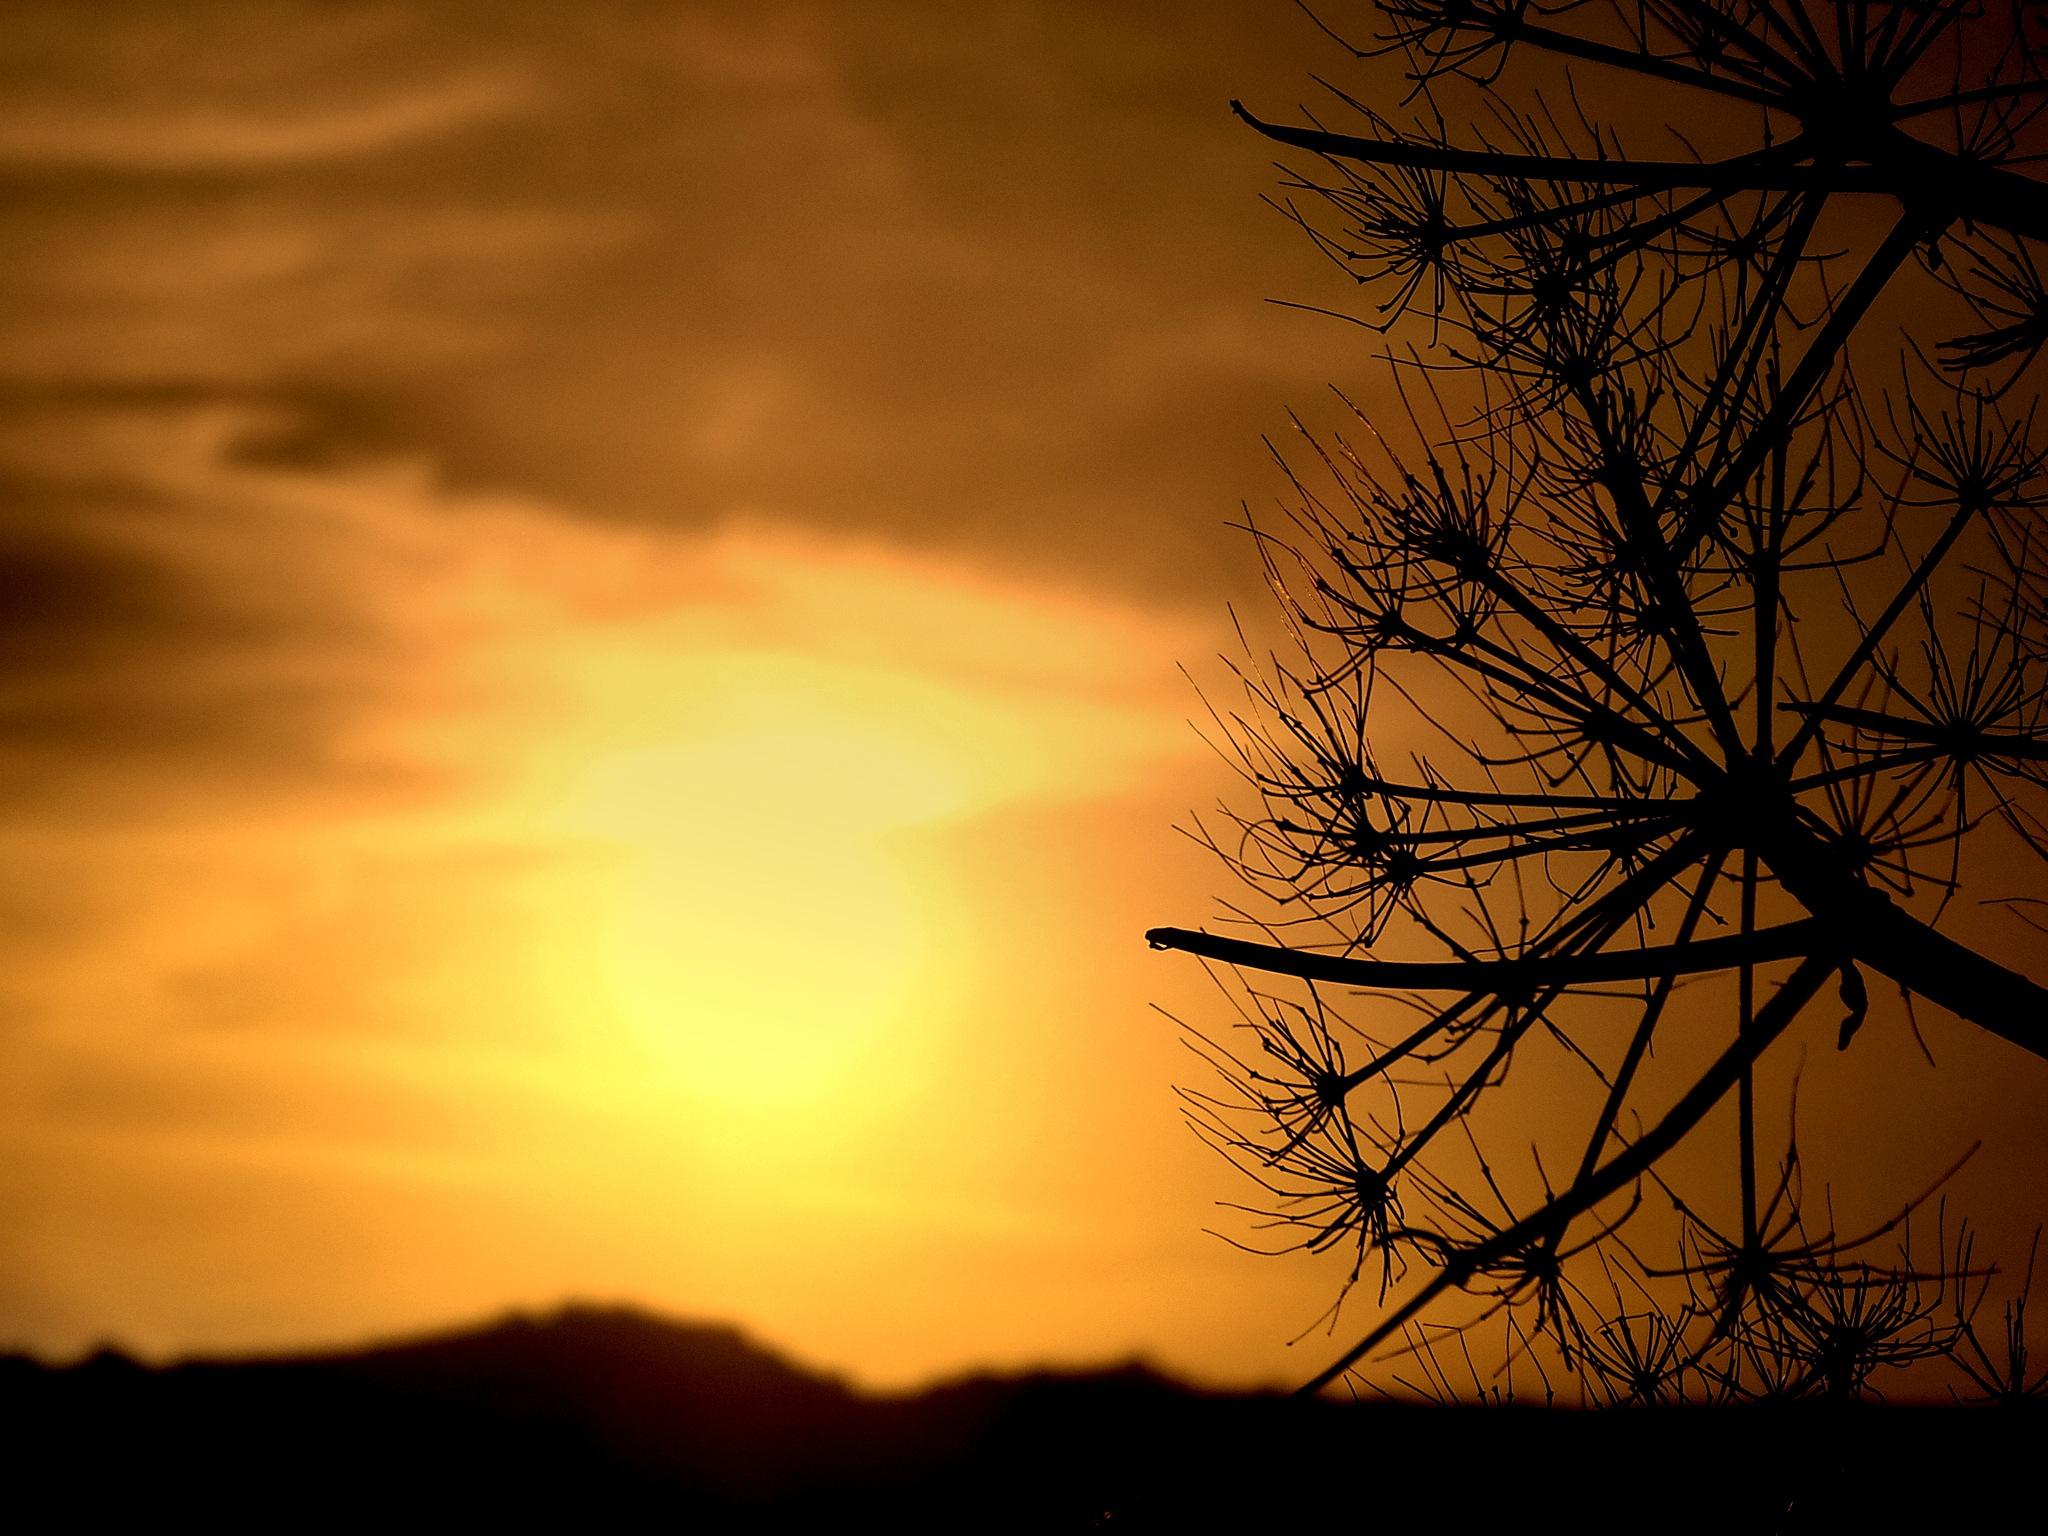 SUNSET AT BITEZ HILLS by Akin Saner